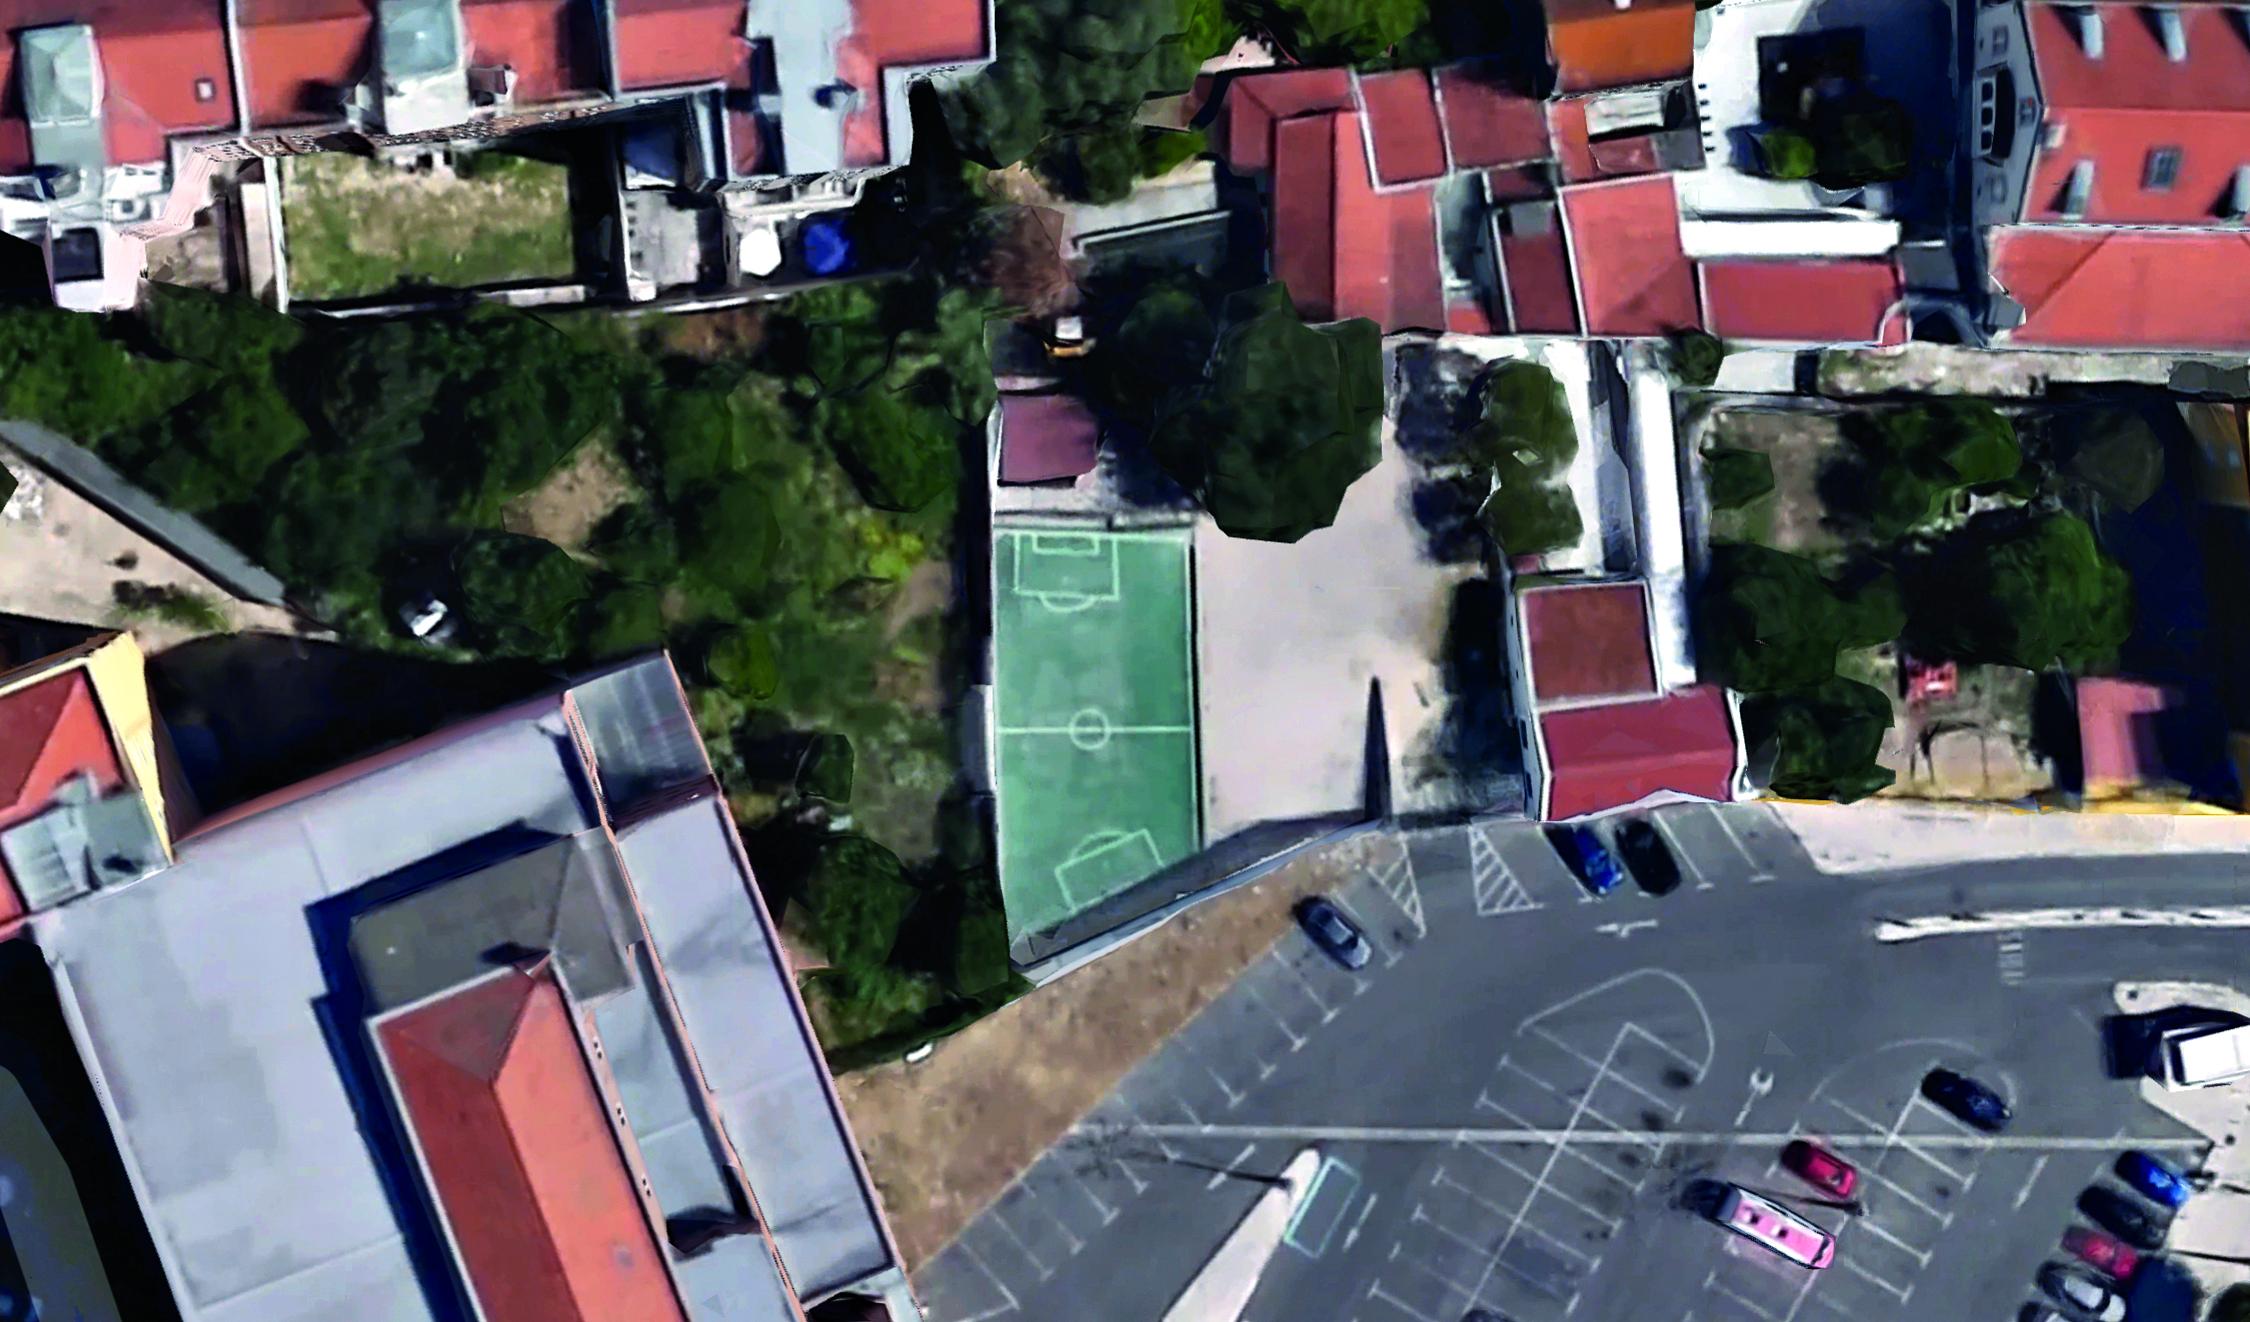 Campo na Avenida Gago Coutinho